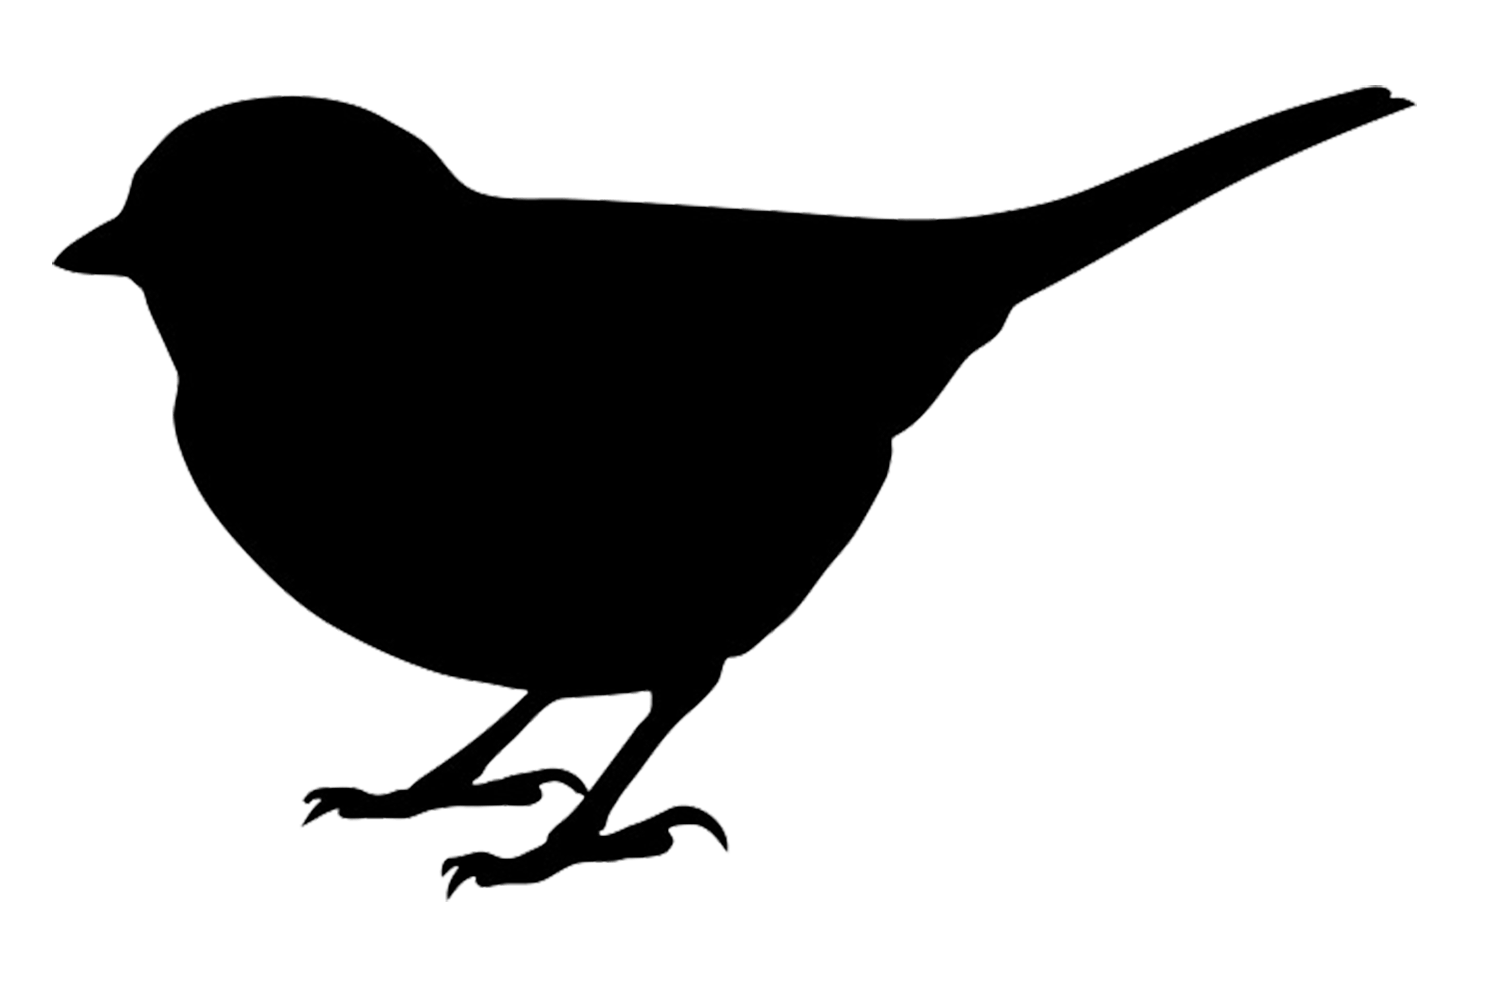 hight resolution of 1494x981 bird silhouettes